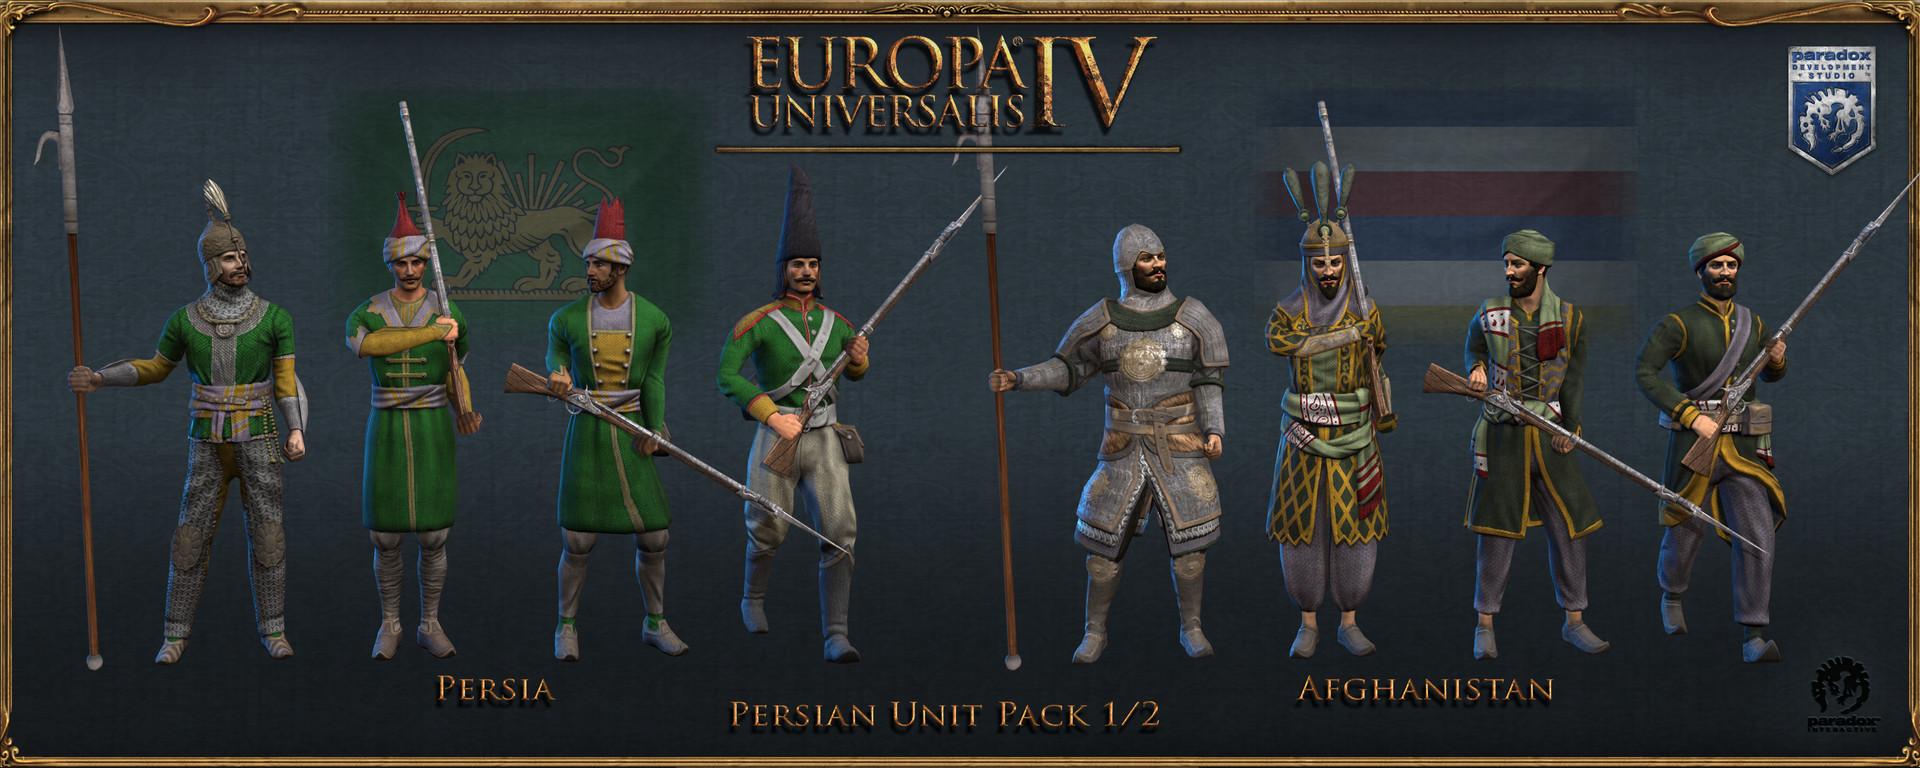 eu4 cradle of civilization free download